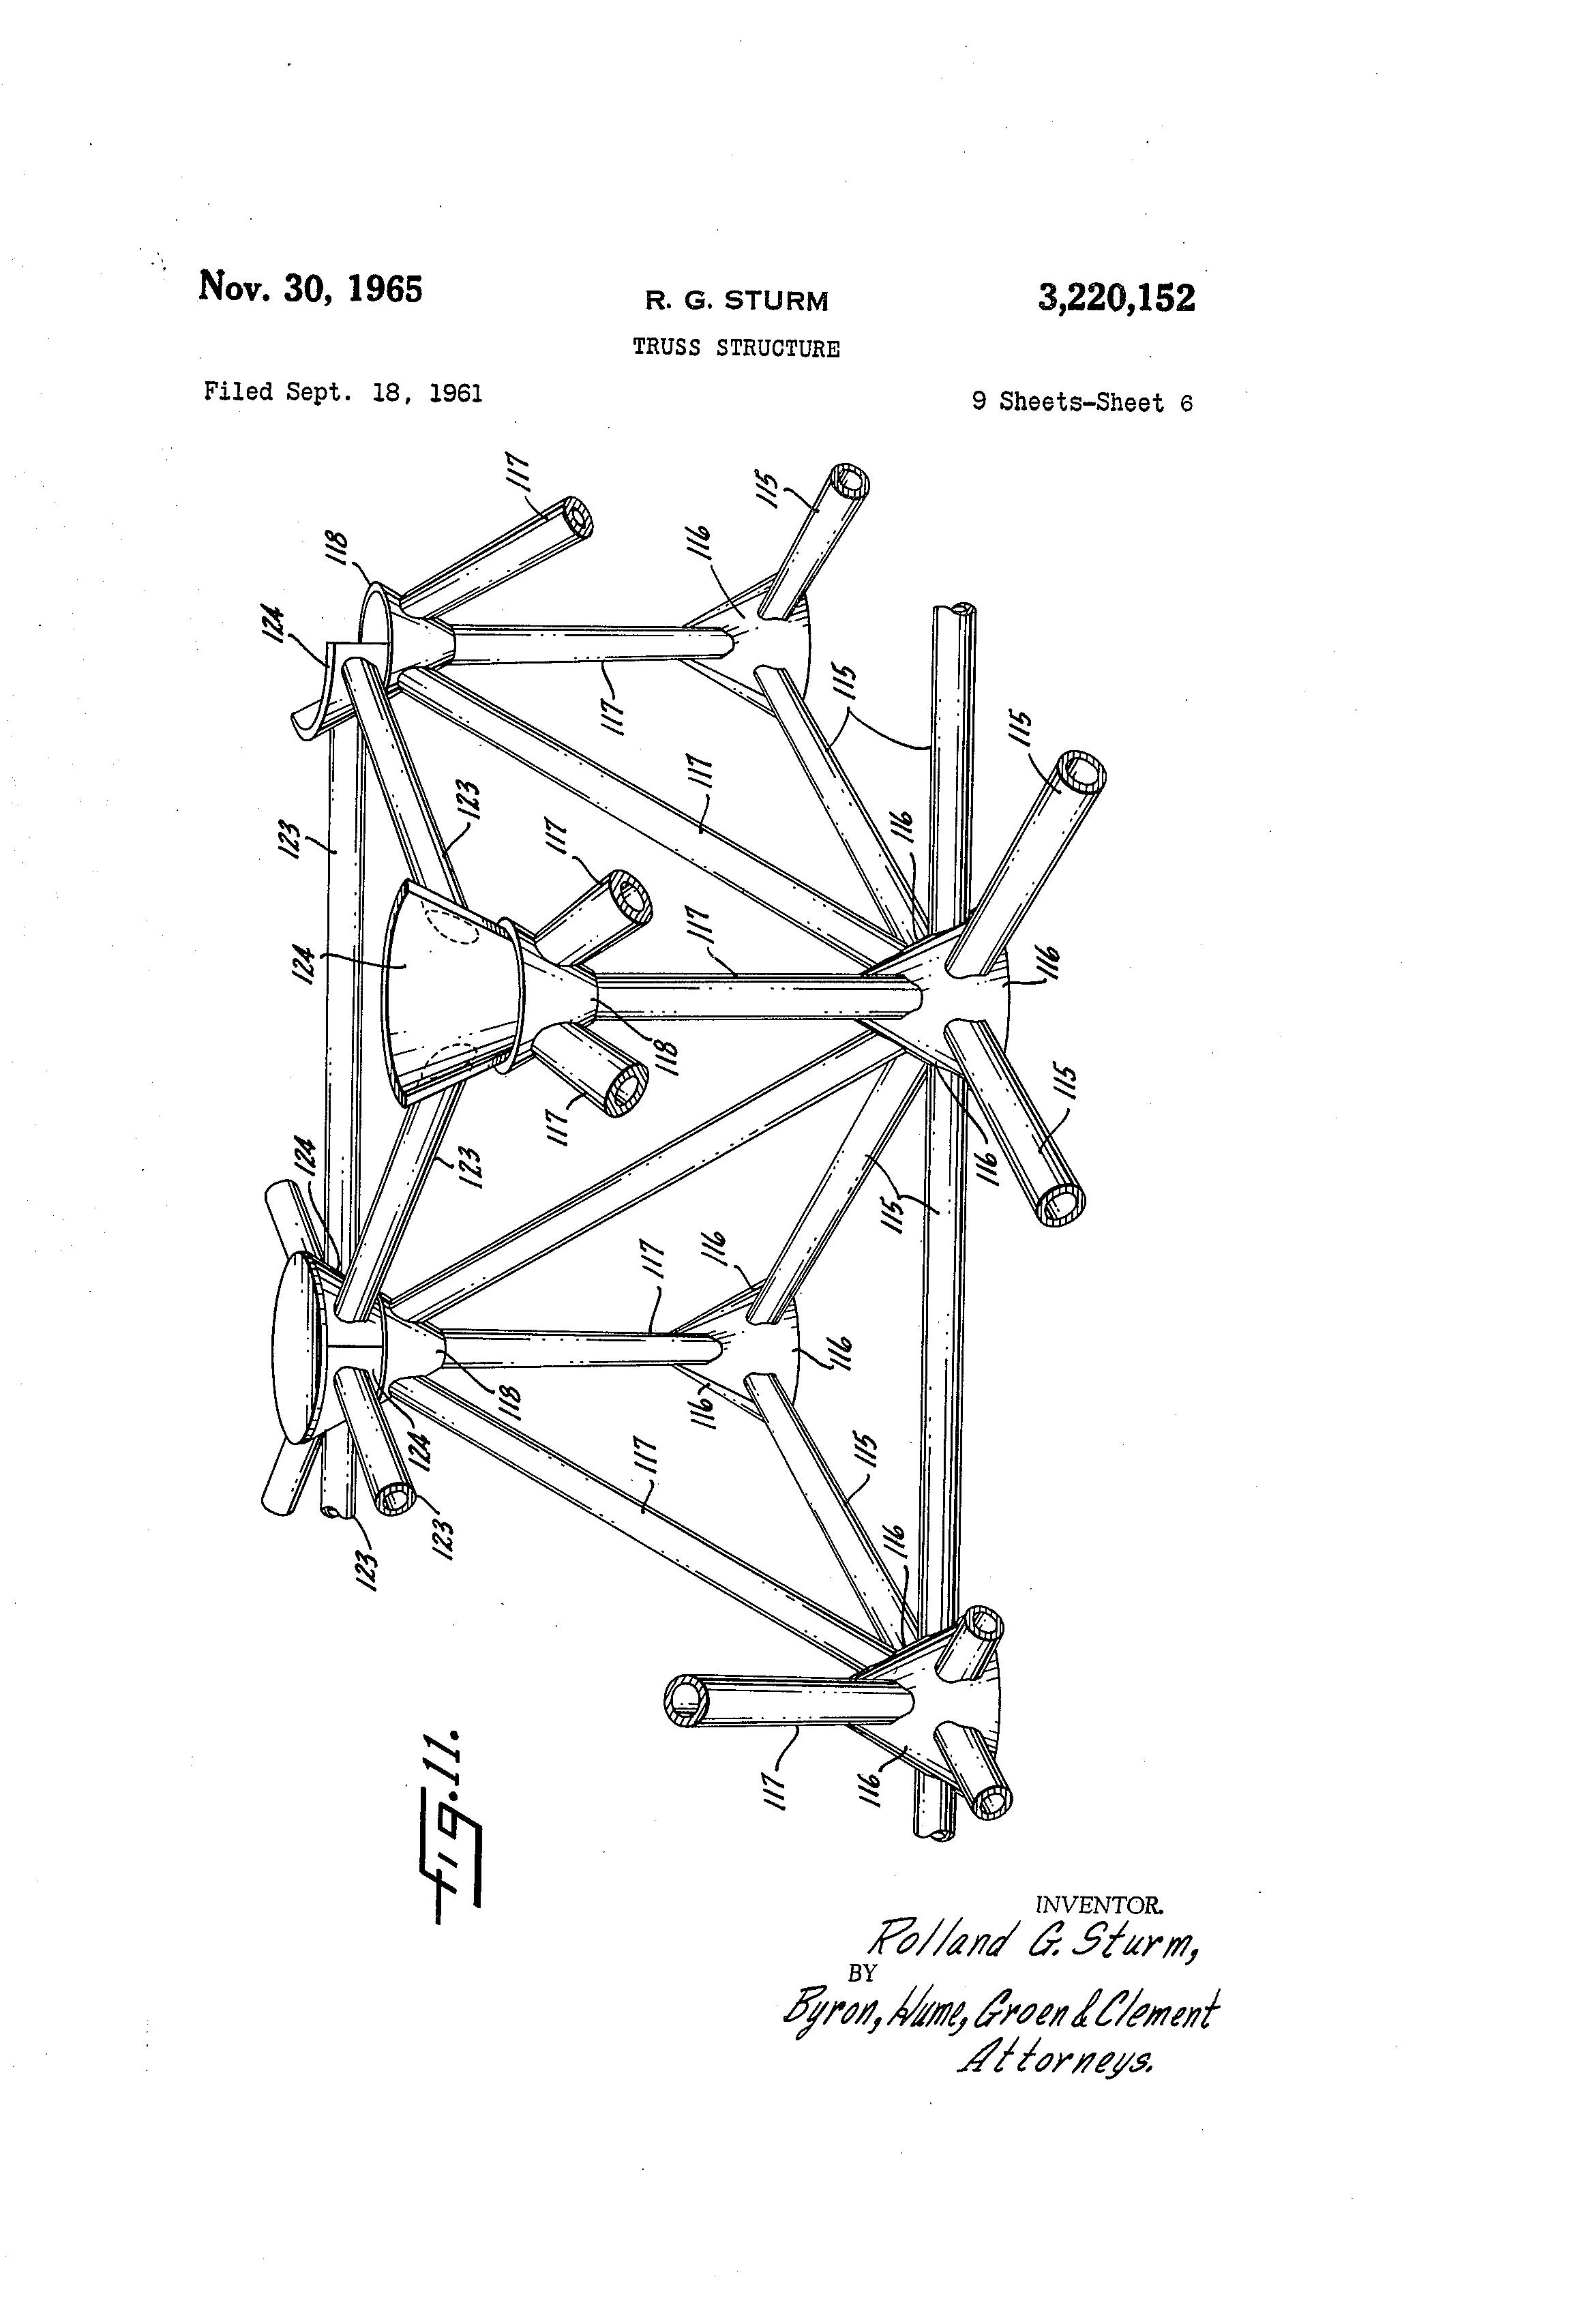 patent us3220152 - truss structure